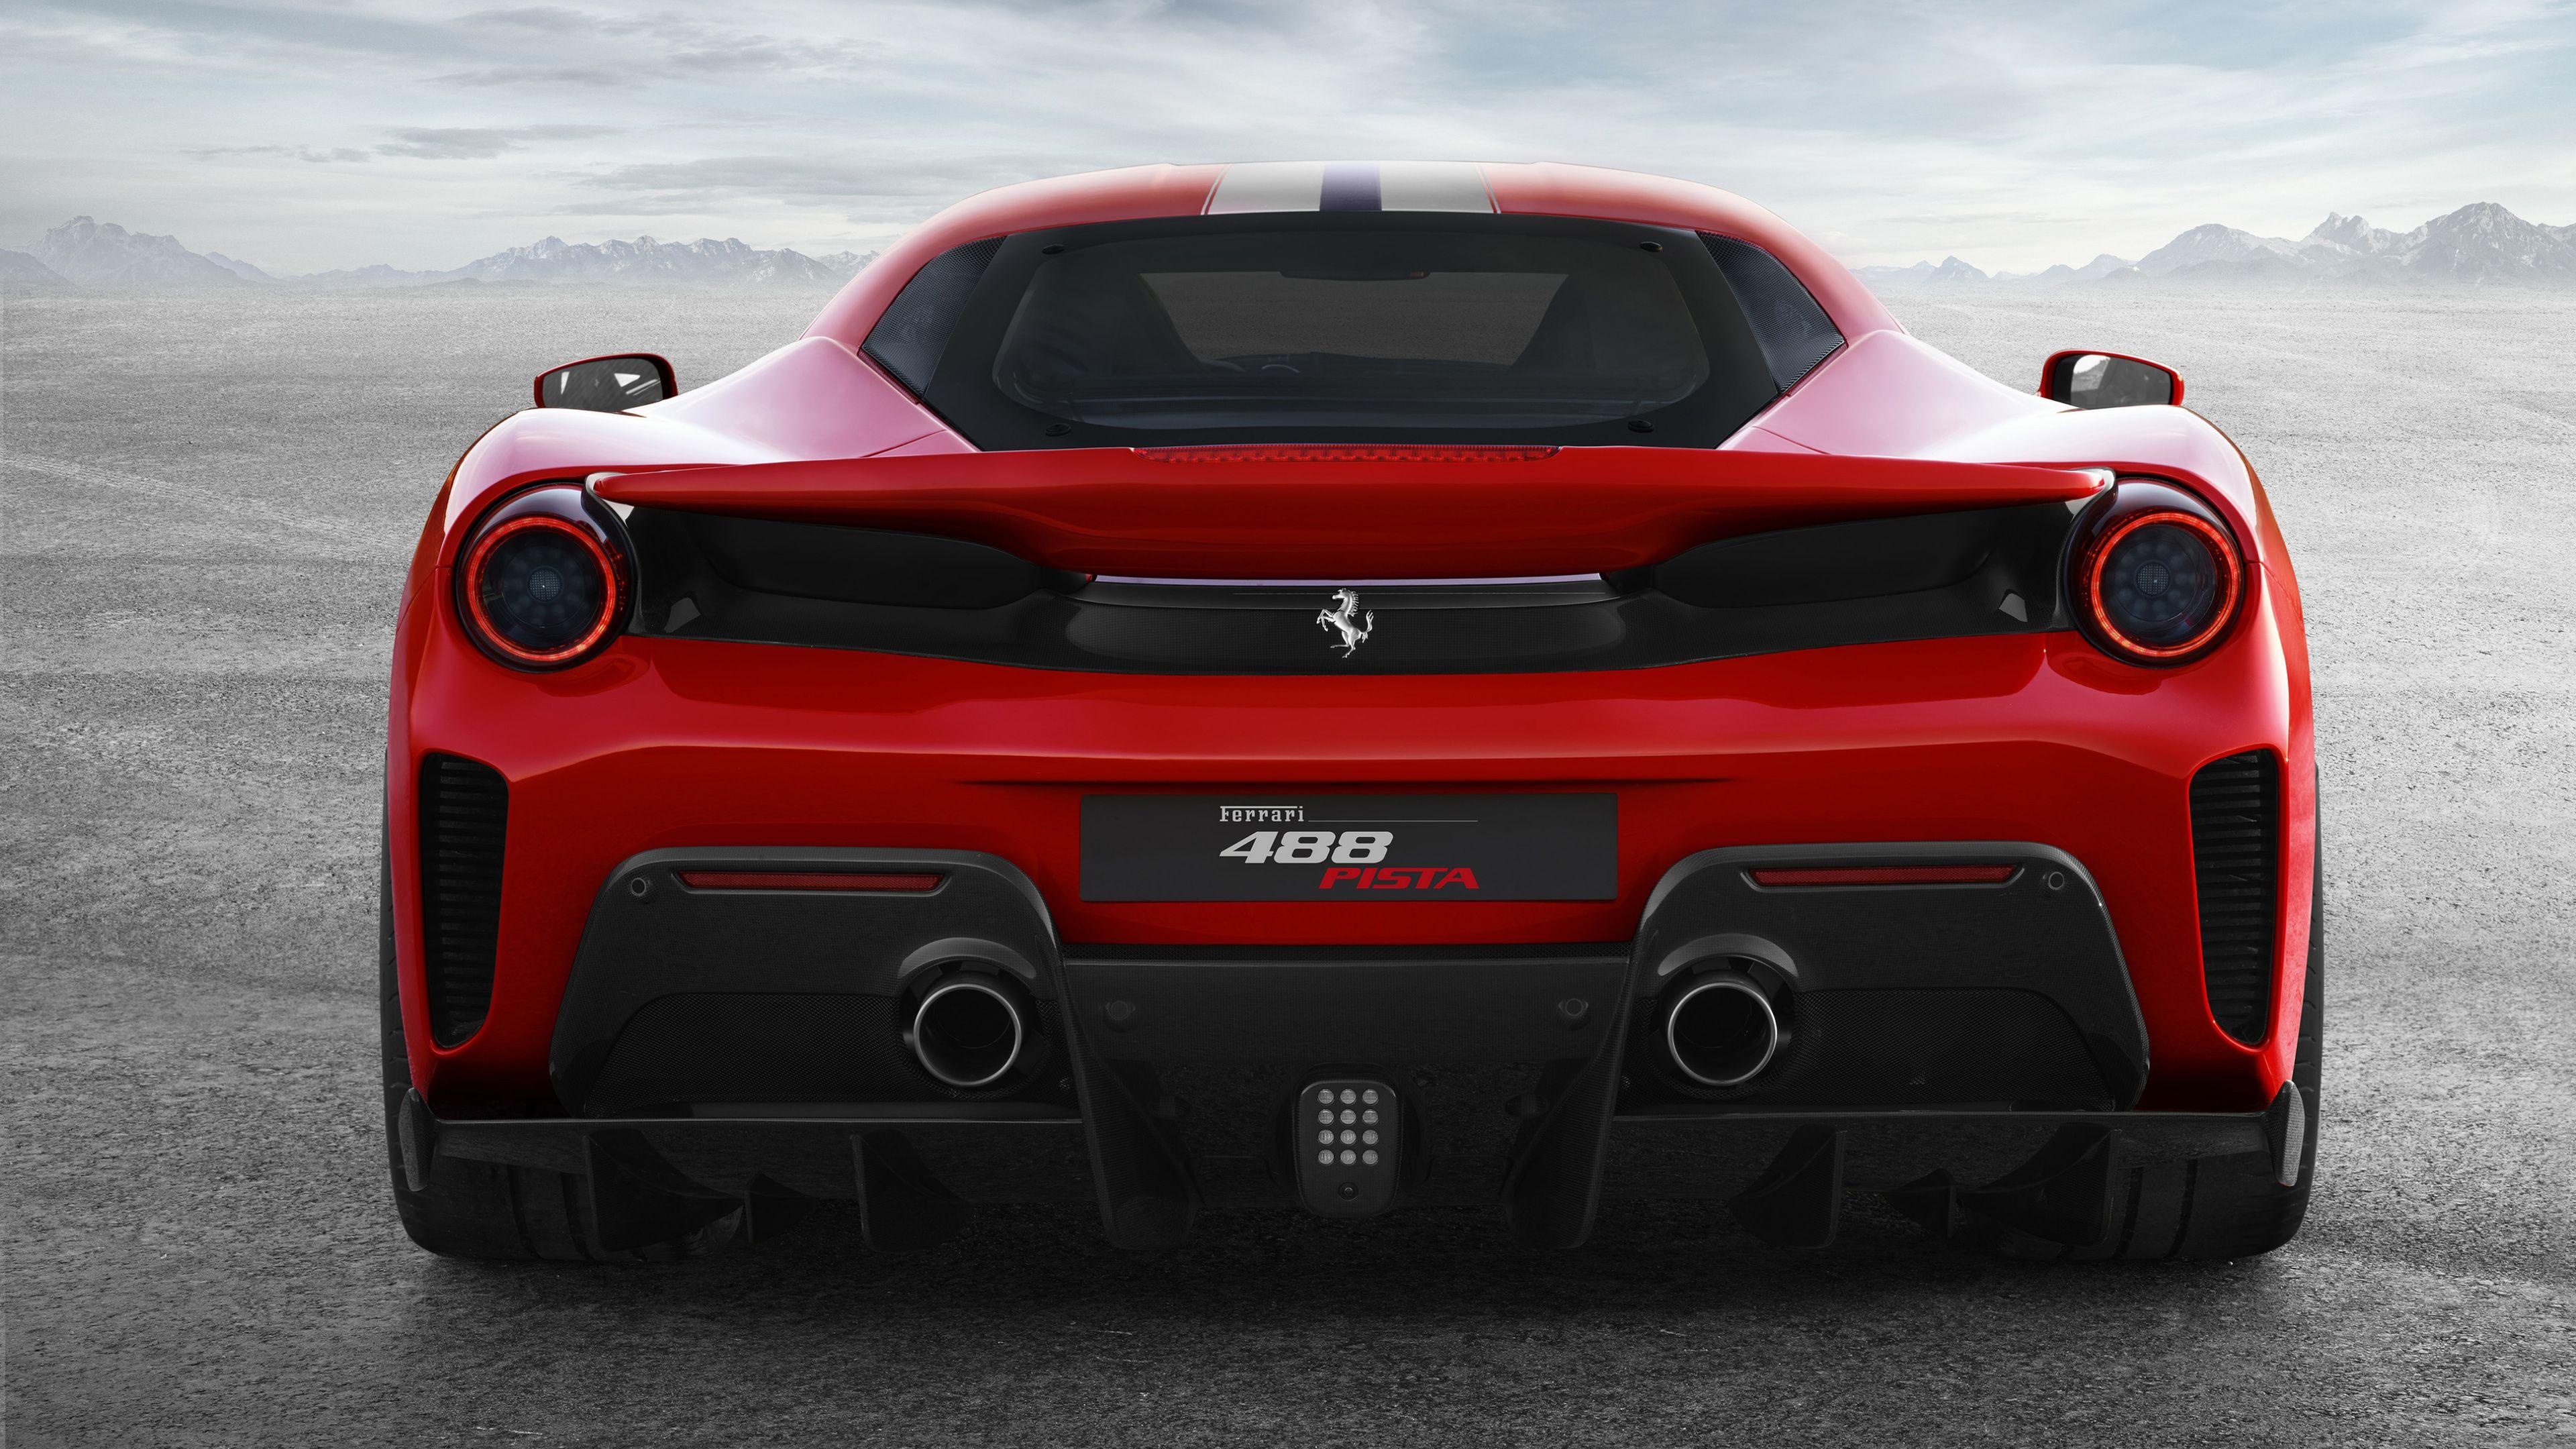 Wallpaper 4k Ferrari 488 Pista Rear View 4k 2018 Cars Wallpapers